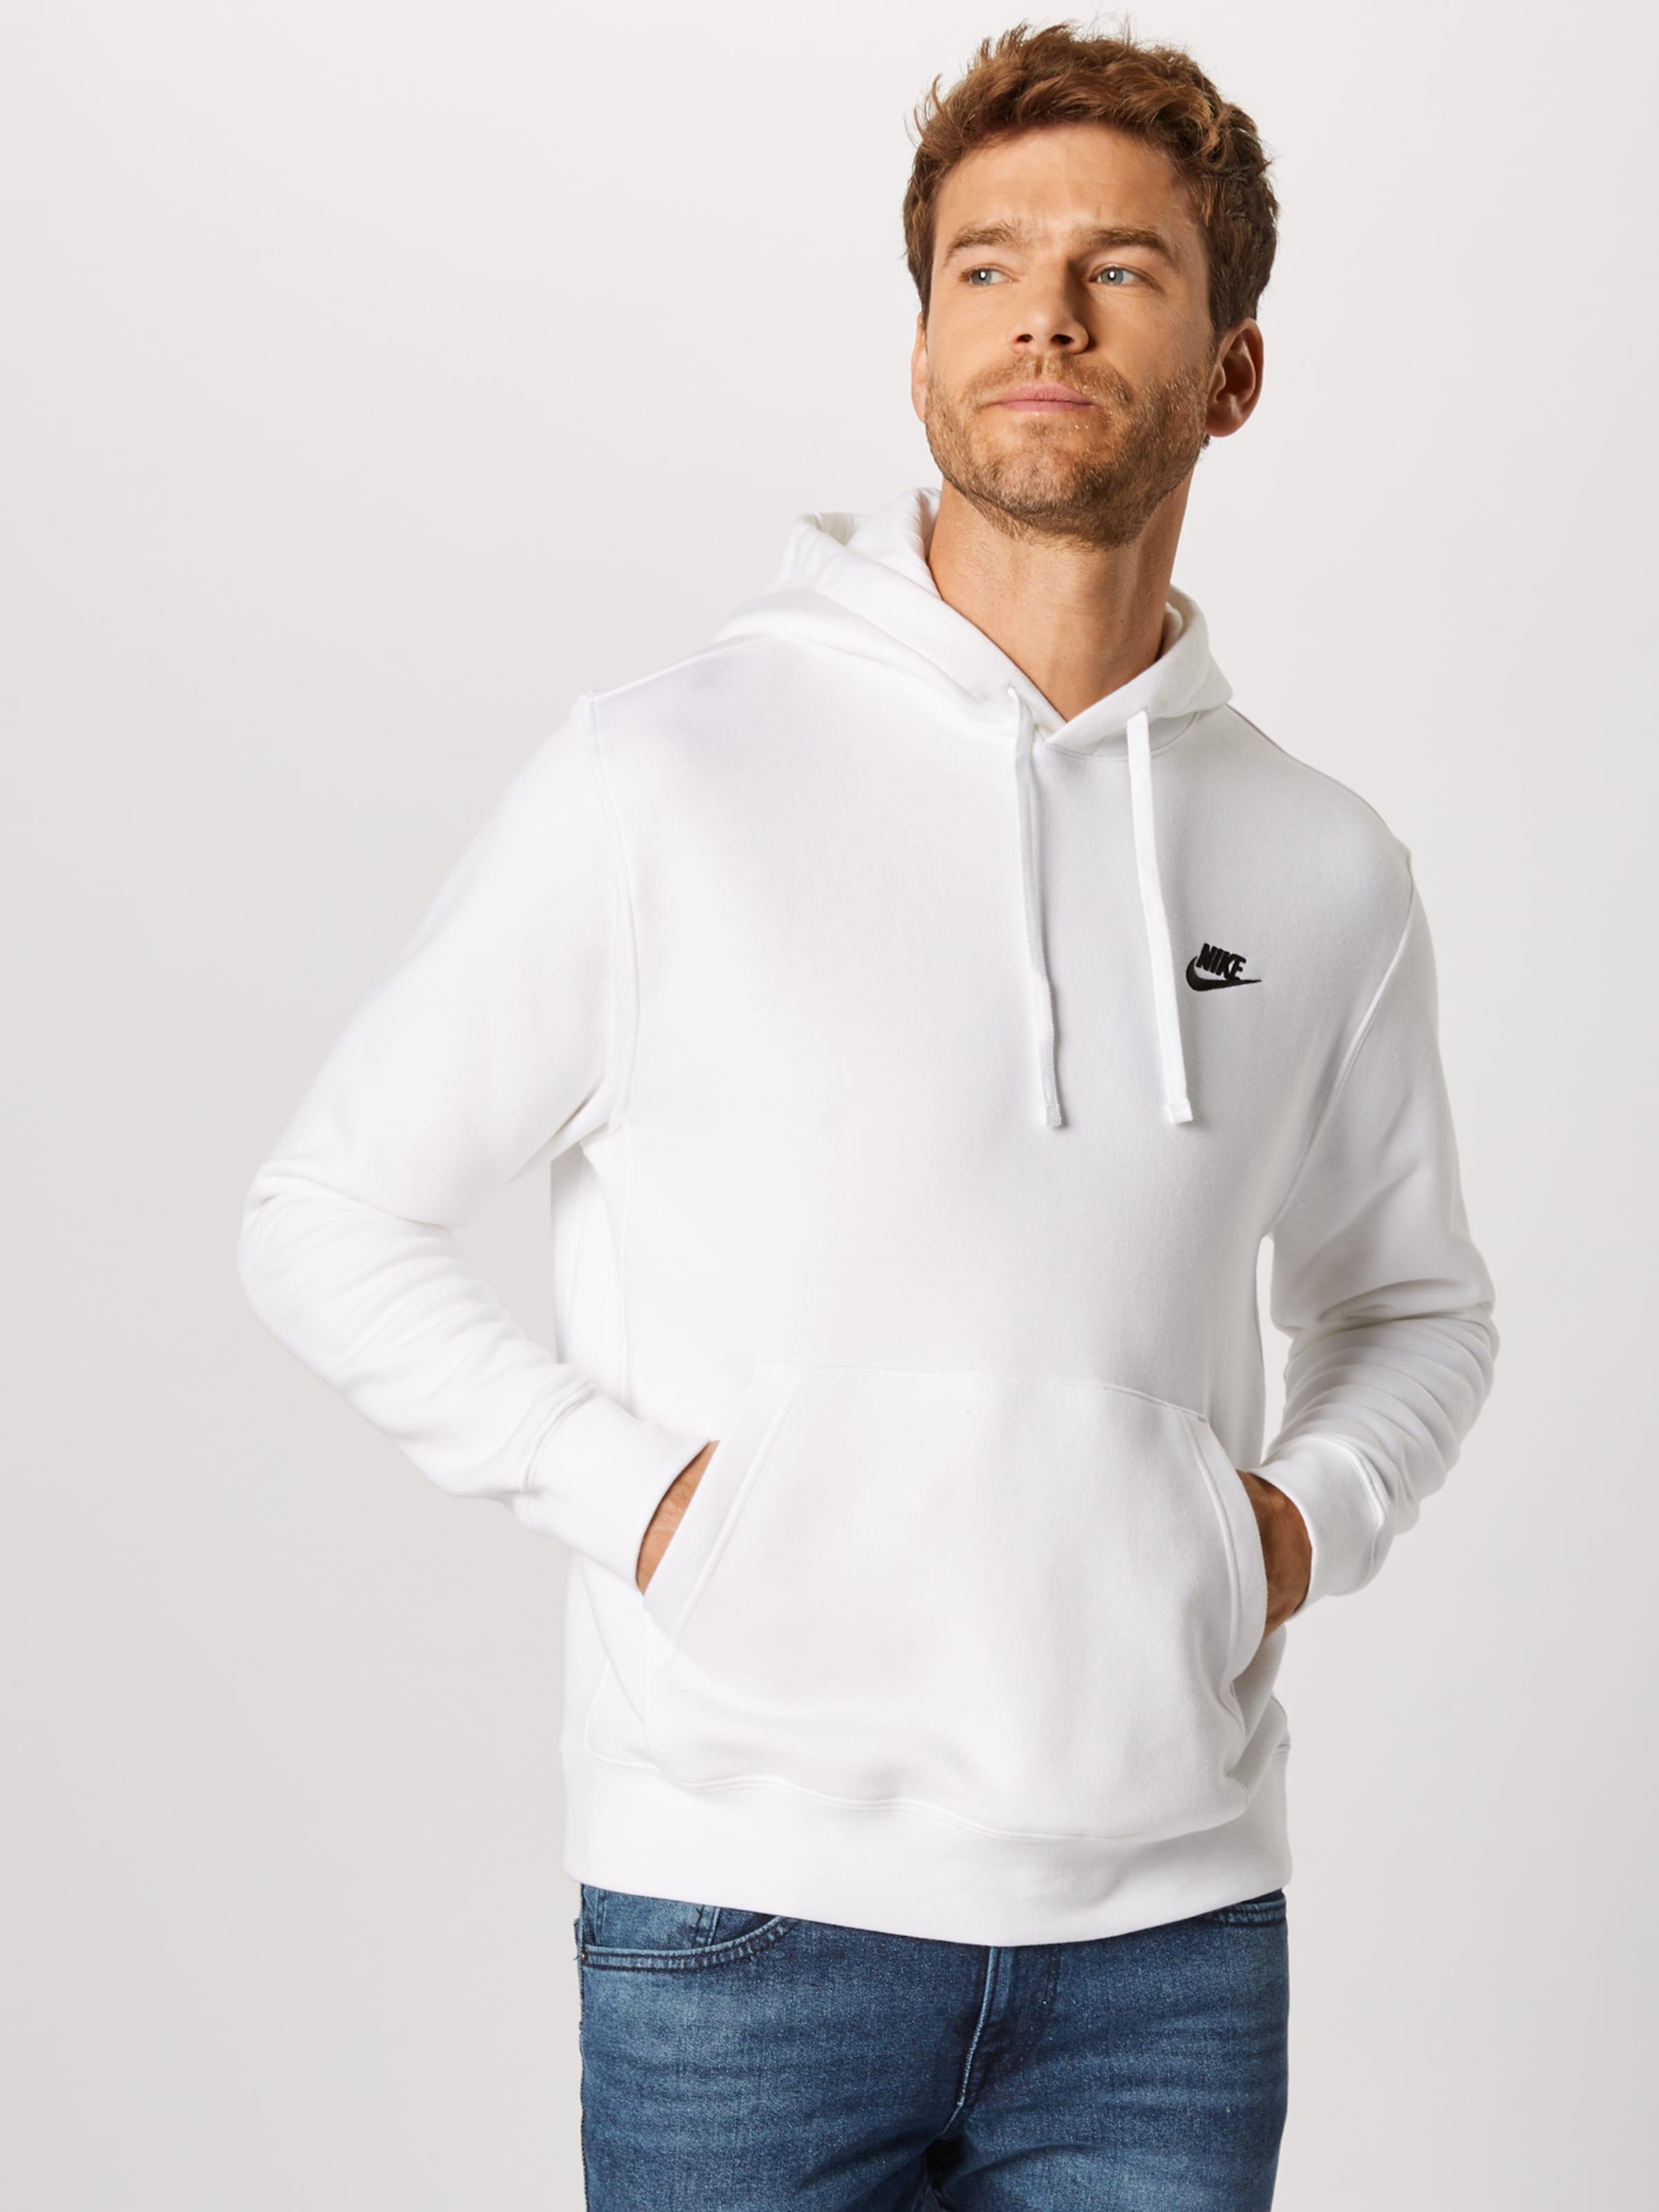 Sportswear Weiß Nike 'club' In Sweatshirt nwO0yvNm8